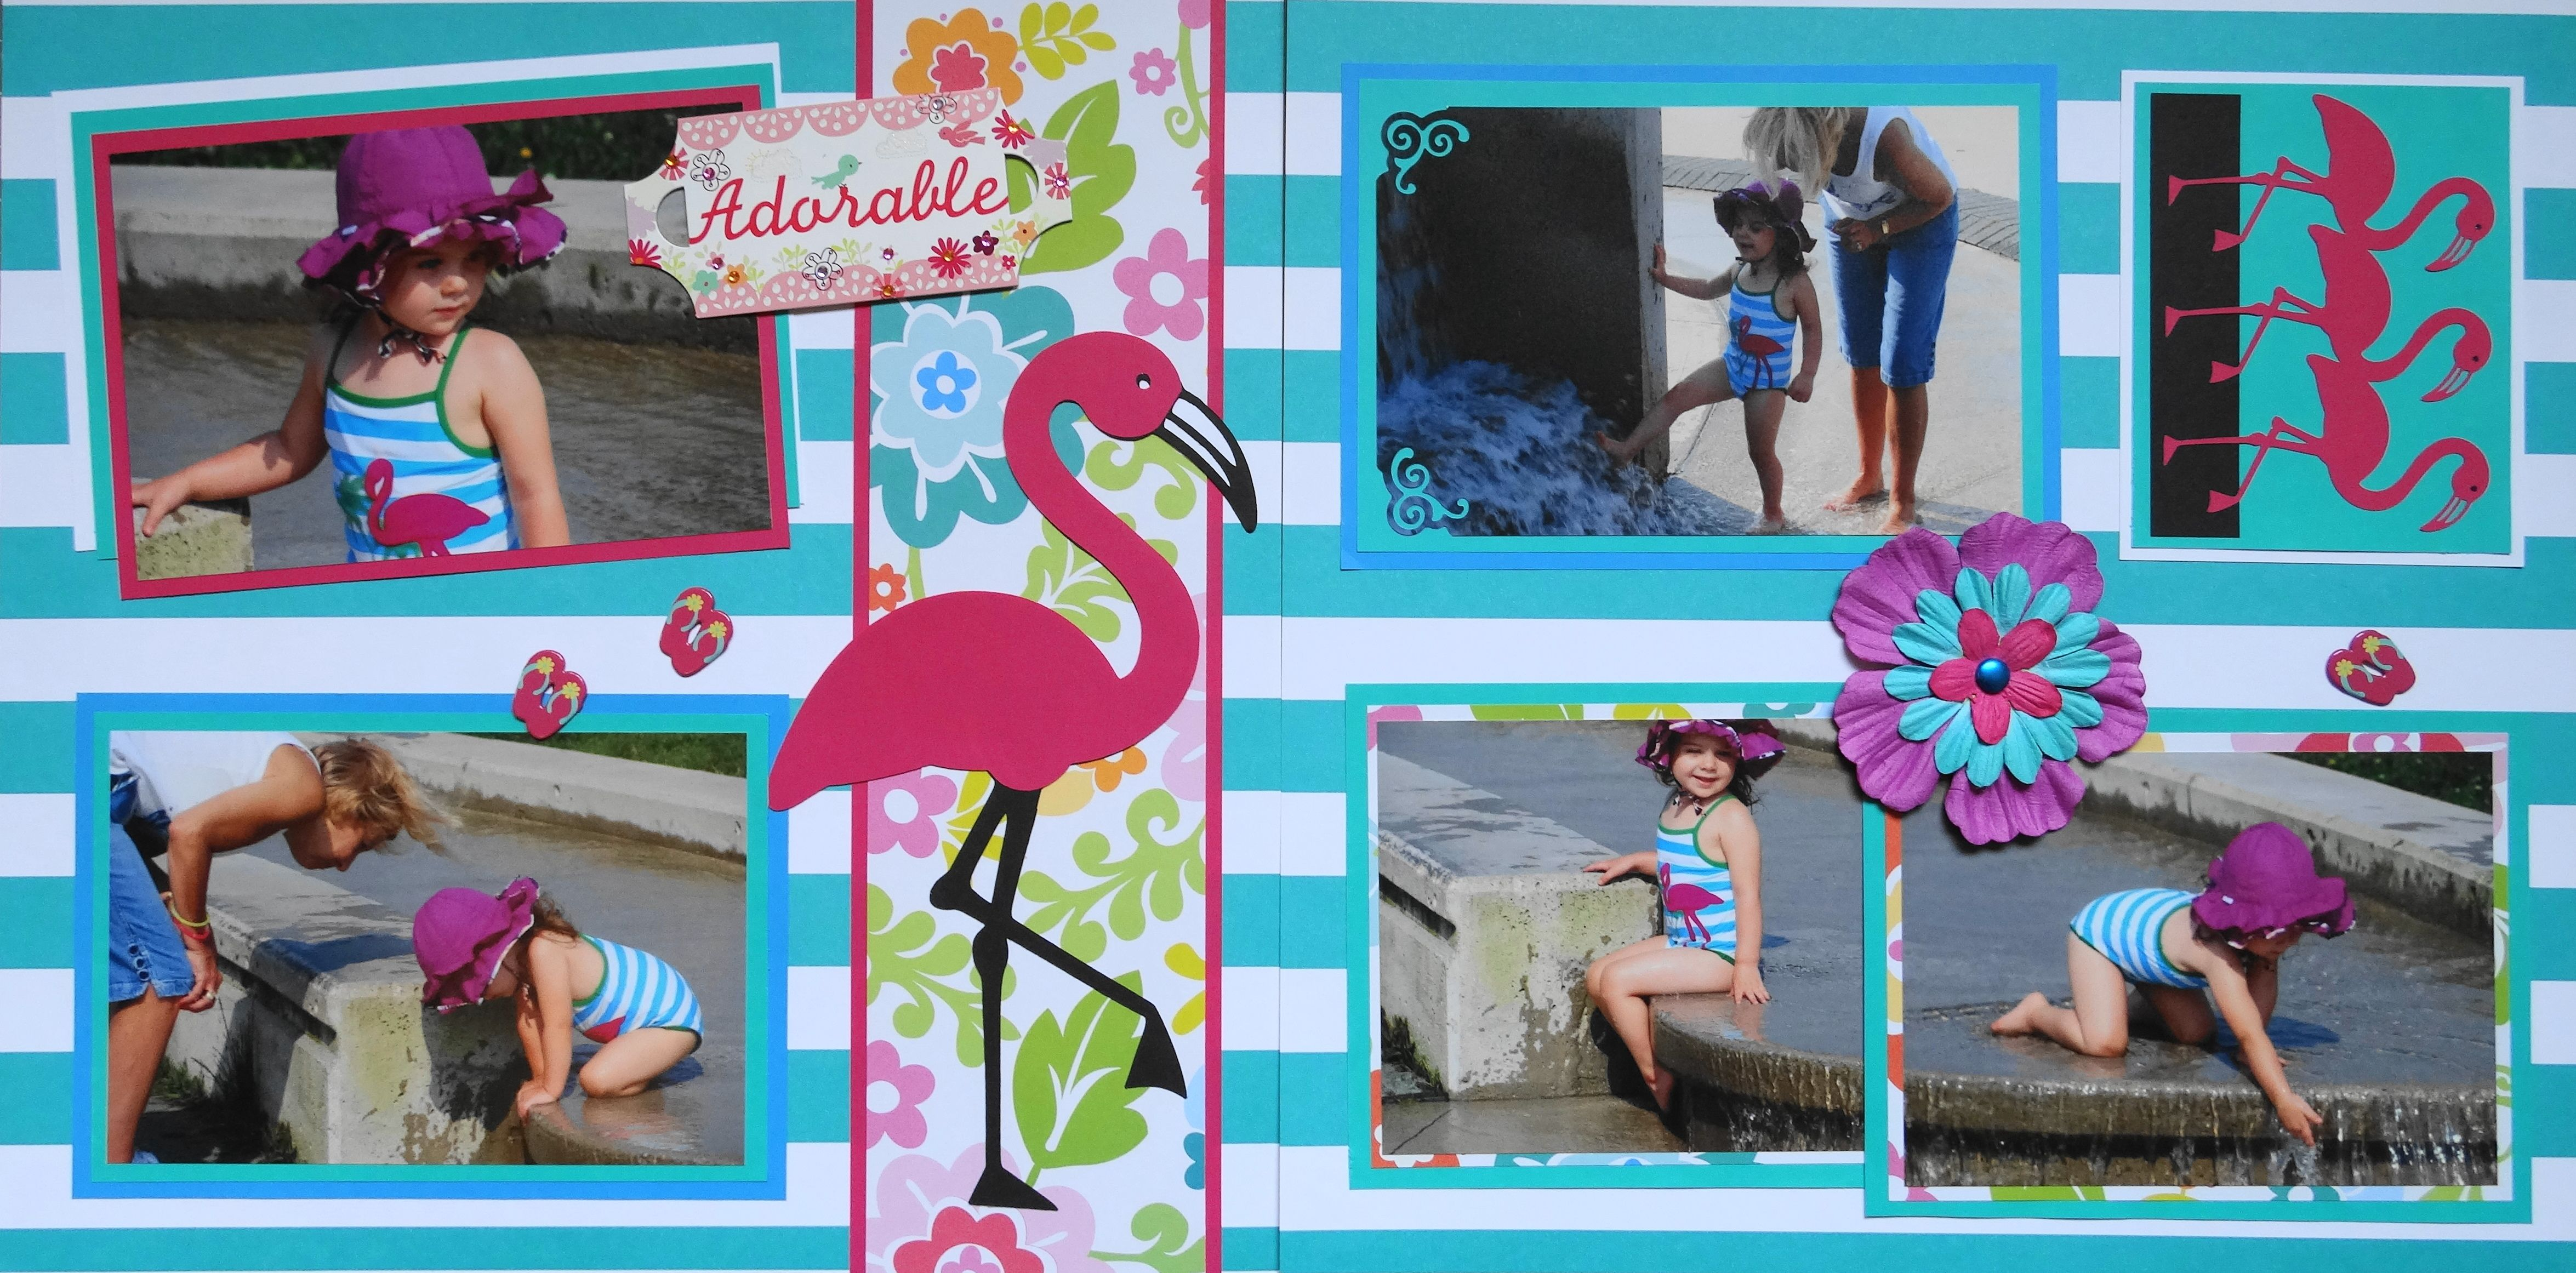 Photo Album Baby Girl Scrapbook Girl Photo Album 8x10 4x6 5x7 Picture Journal Baby Photo Album Pink Blue Flower